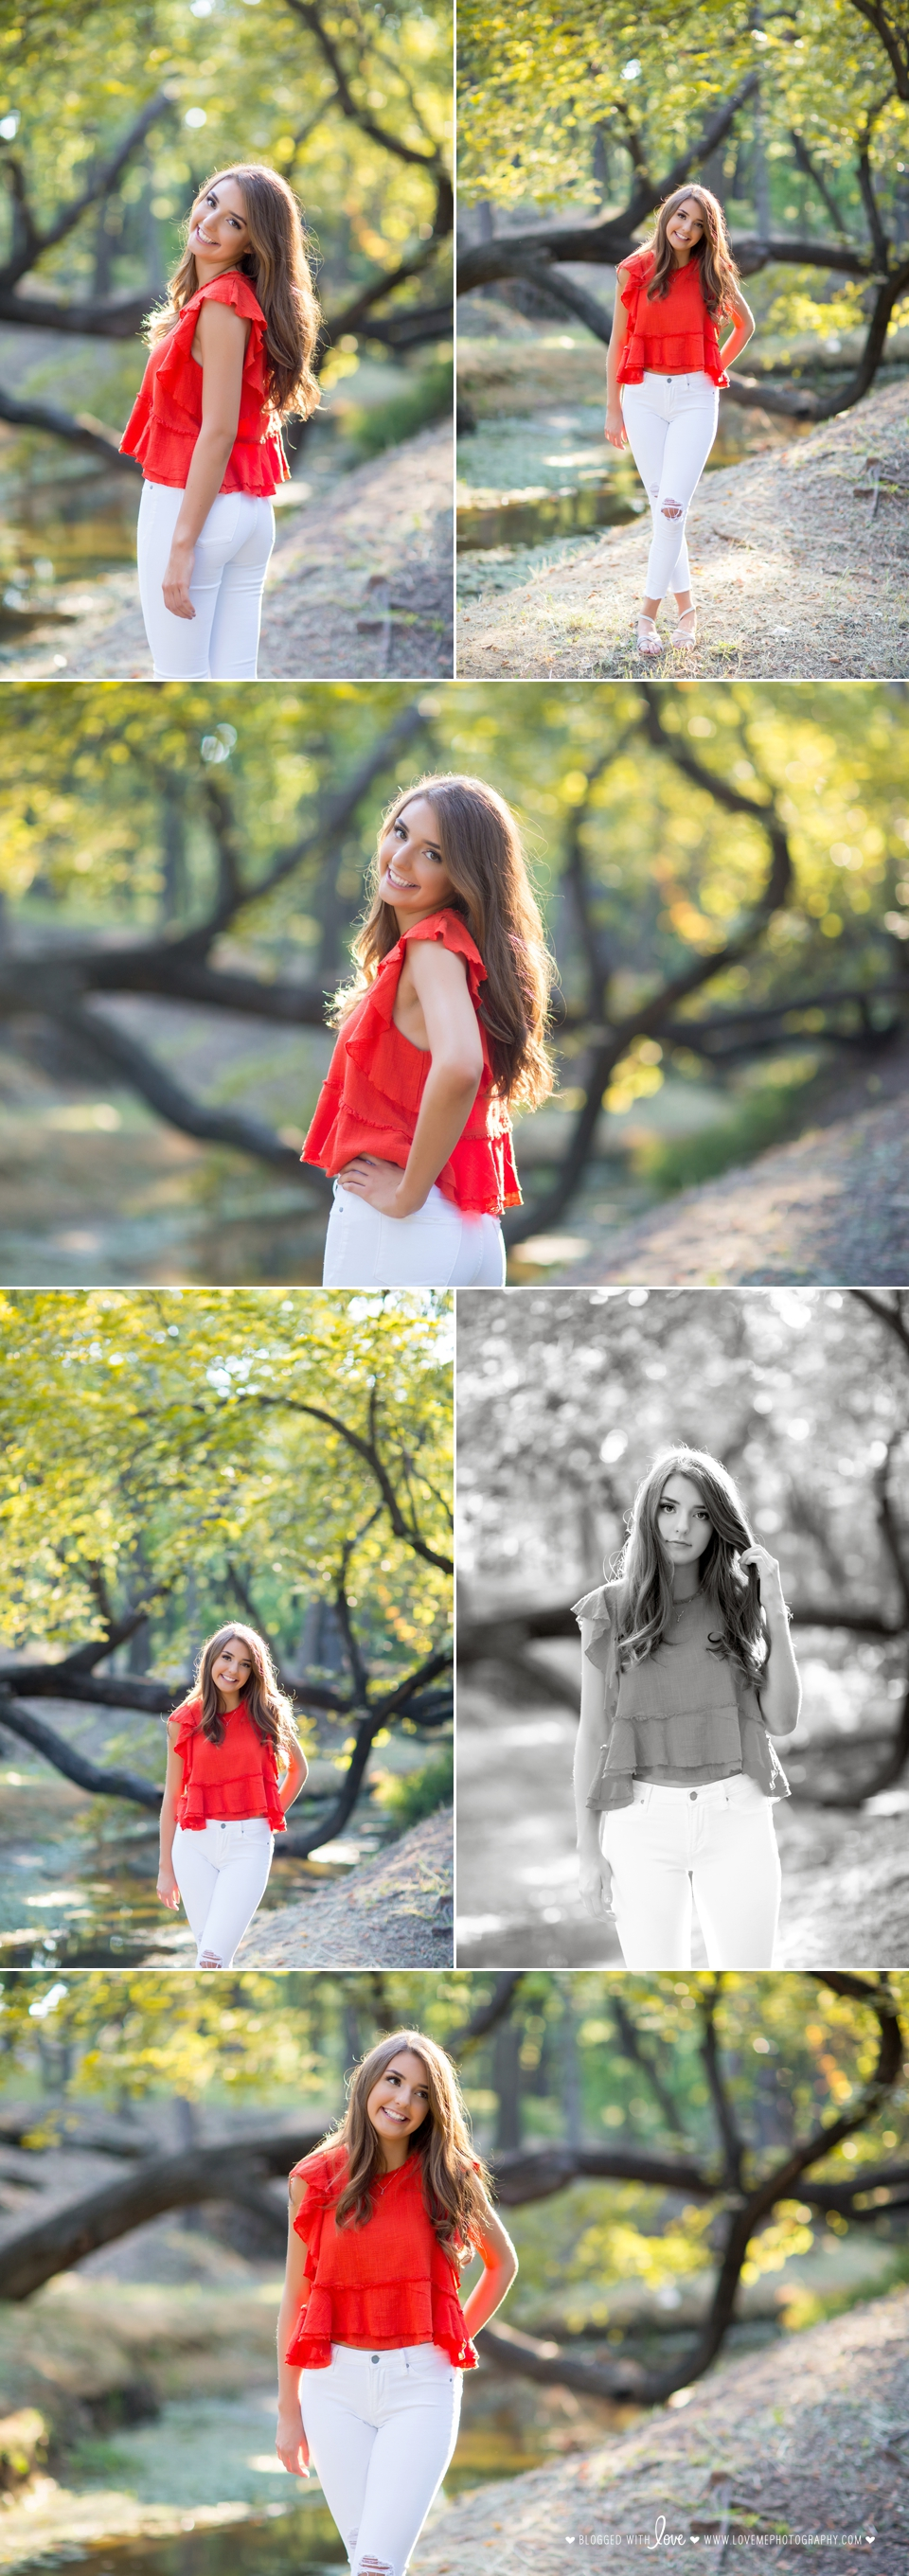 Halee's Senior Portrait Session | Grapevine and Southlake Senior Portrait Photographer | Love, Me Photography